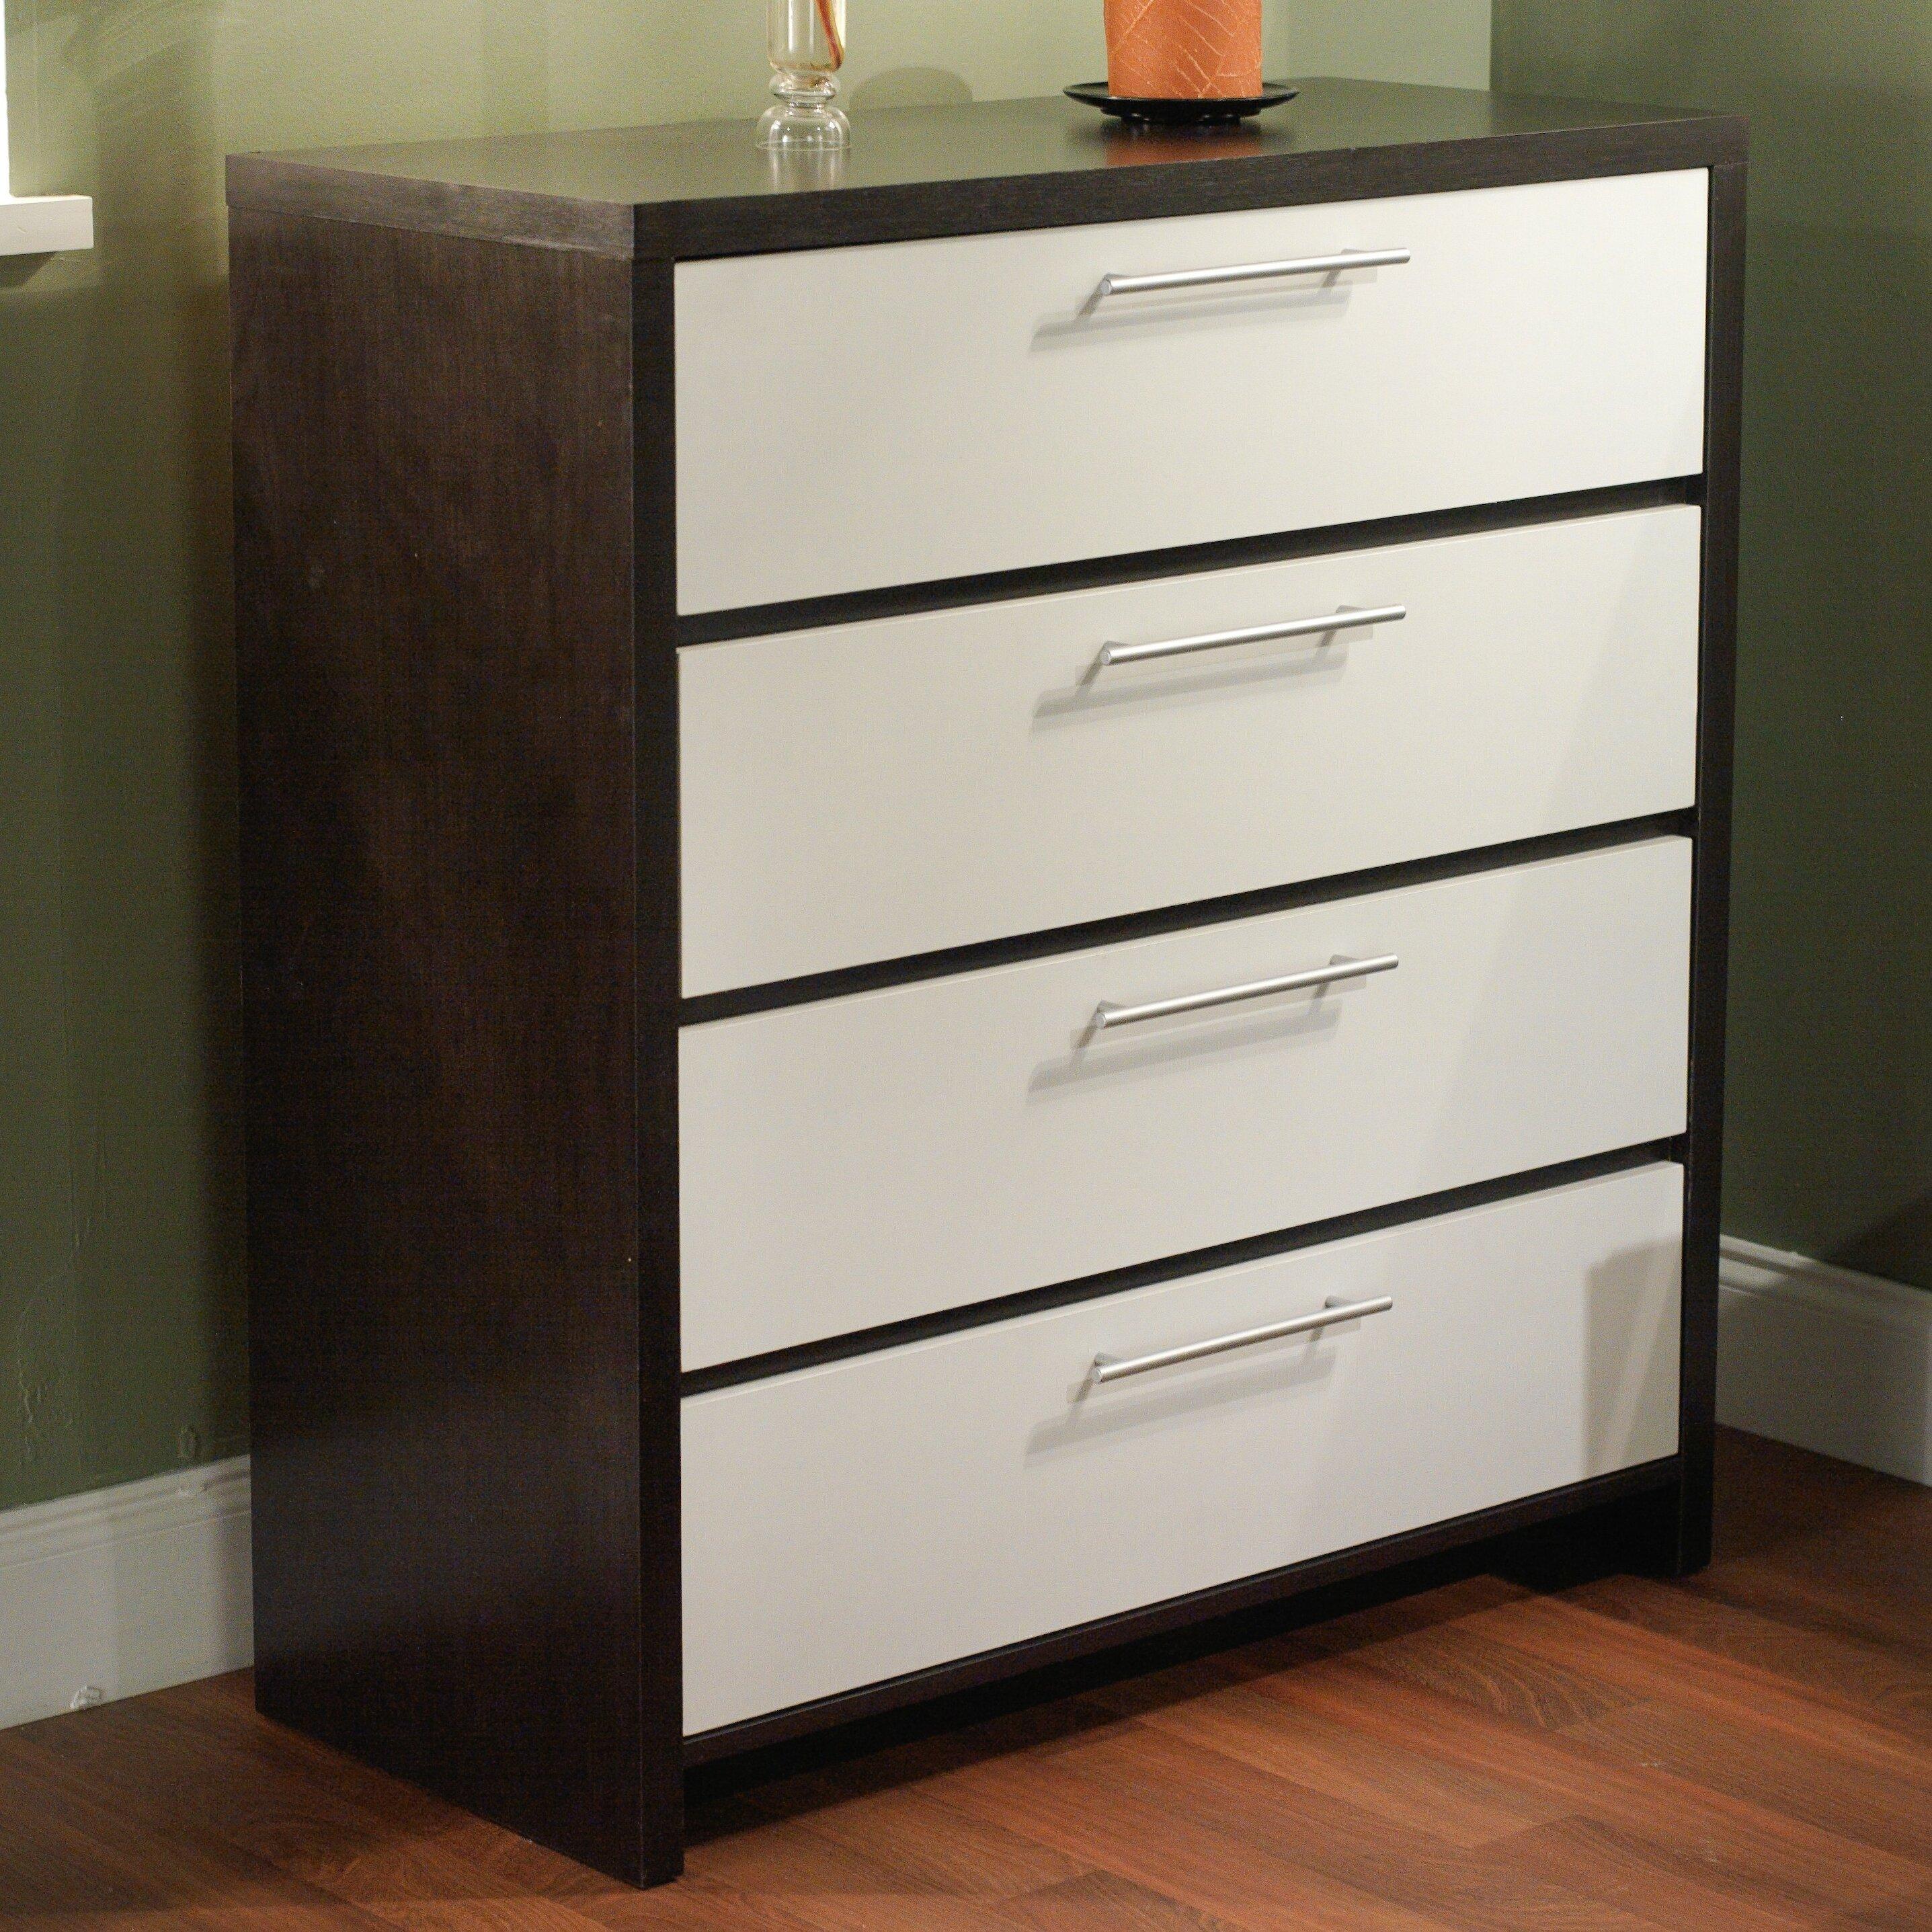 tms 4 drawer chest reviews wayfair. Black Bedroom Furniture Sets. Home Design Ideas